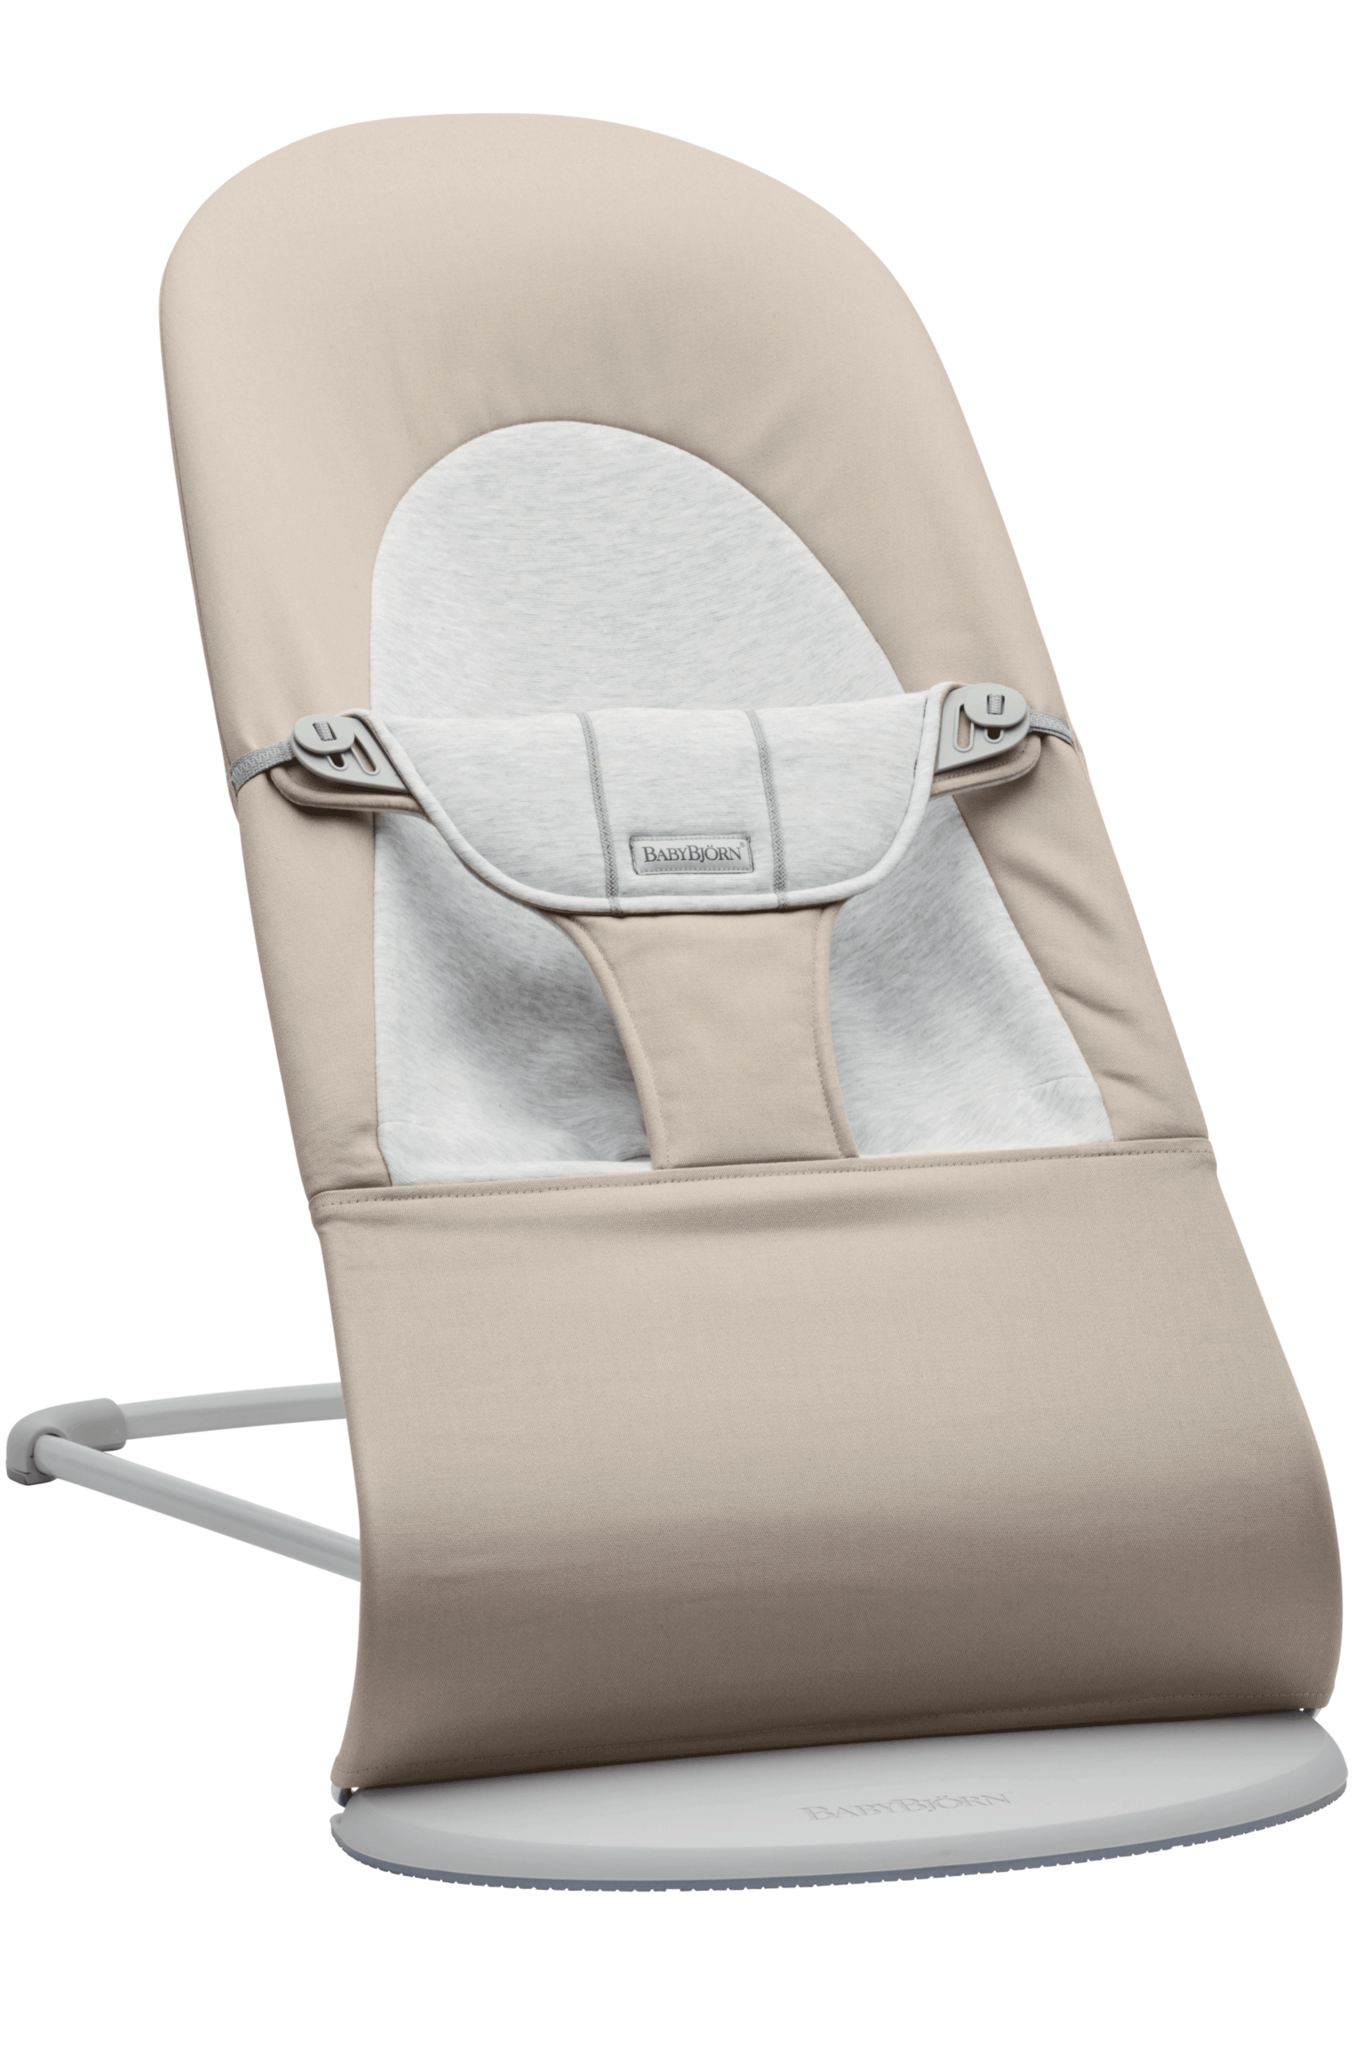 BABYBJÖRN Wipstoeltje Balance Soft Lichtgrijs frame Beige-Grijs Cotton Jersey